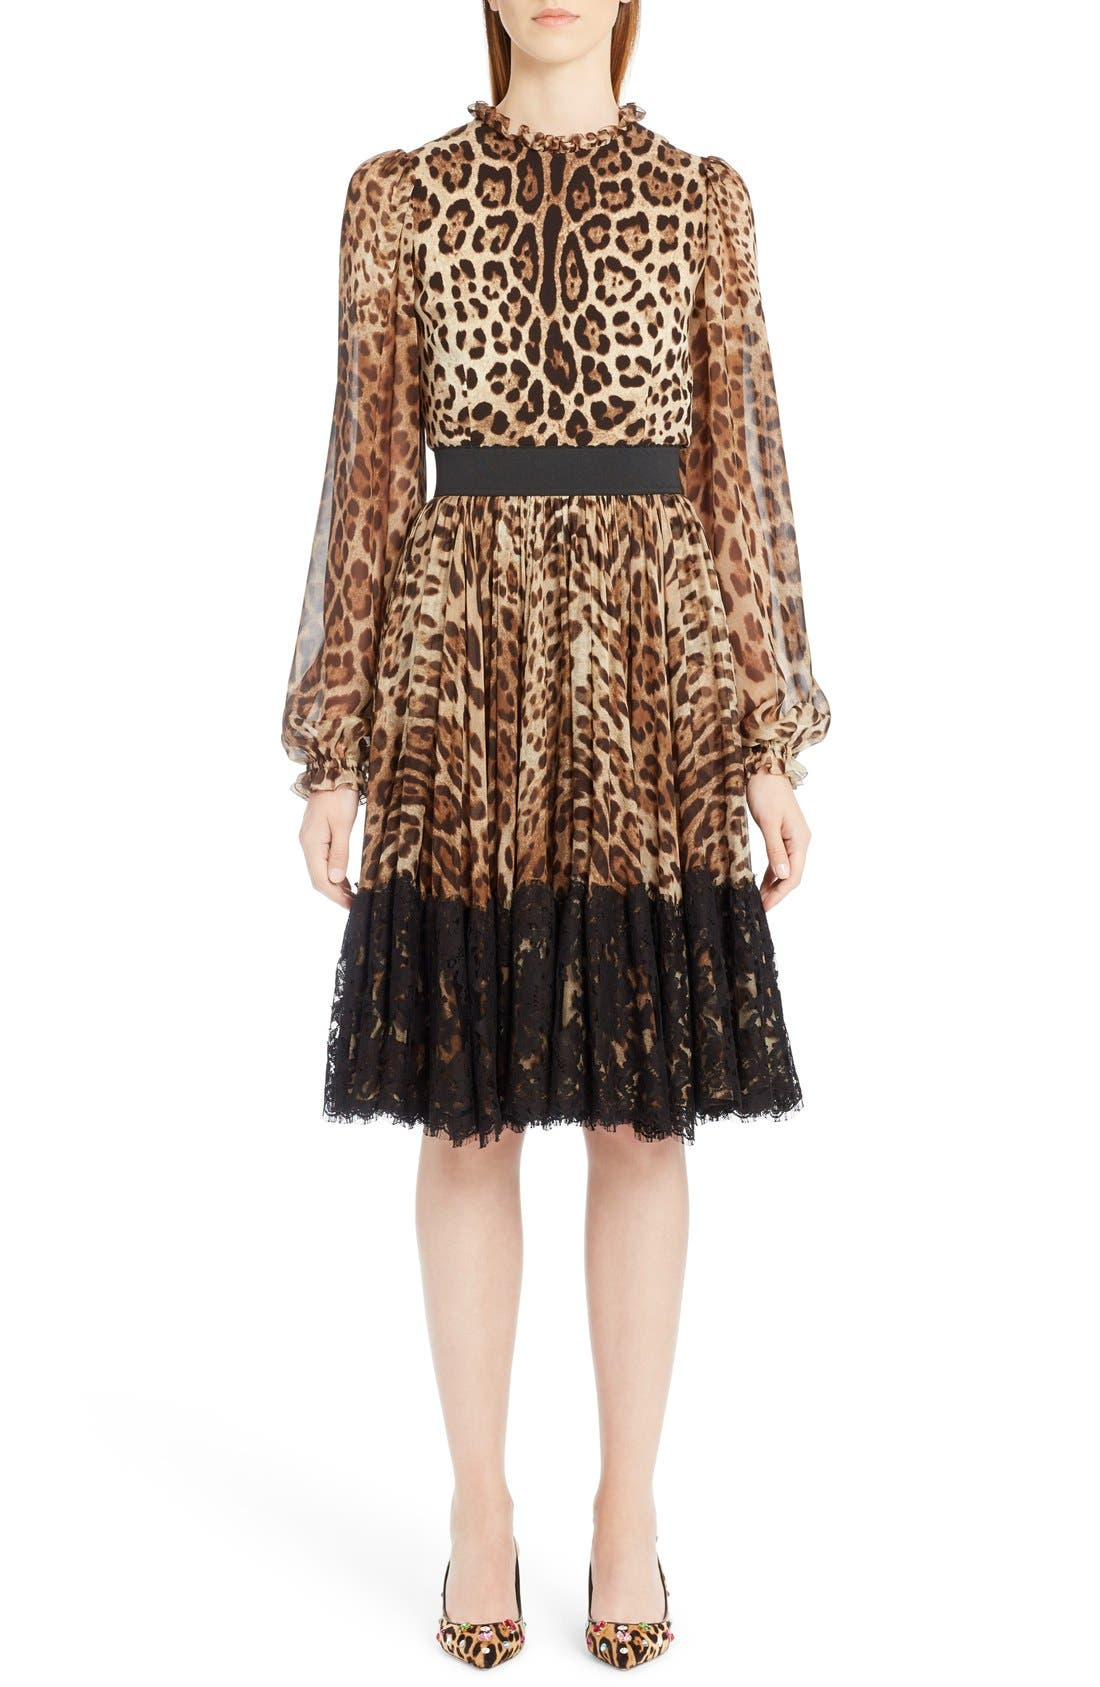 Lace Overlay Leopard Print Chiffon Full Skirt,                             Alternate thumbnail 6, color,                             Leopard